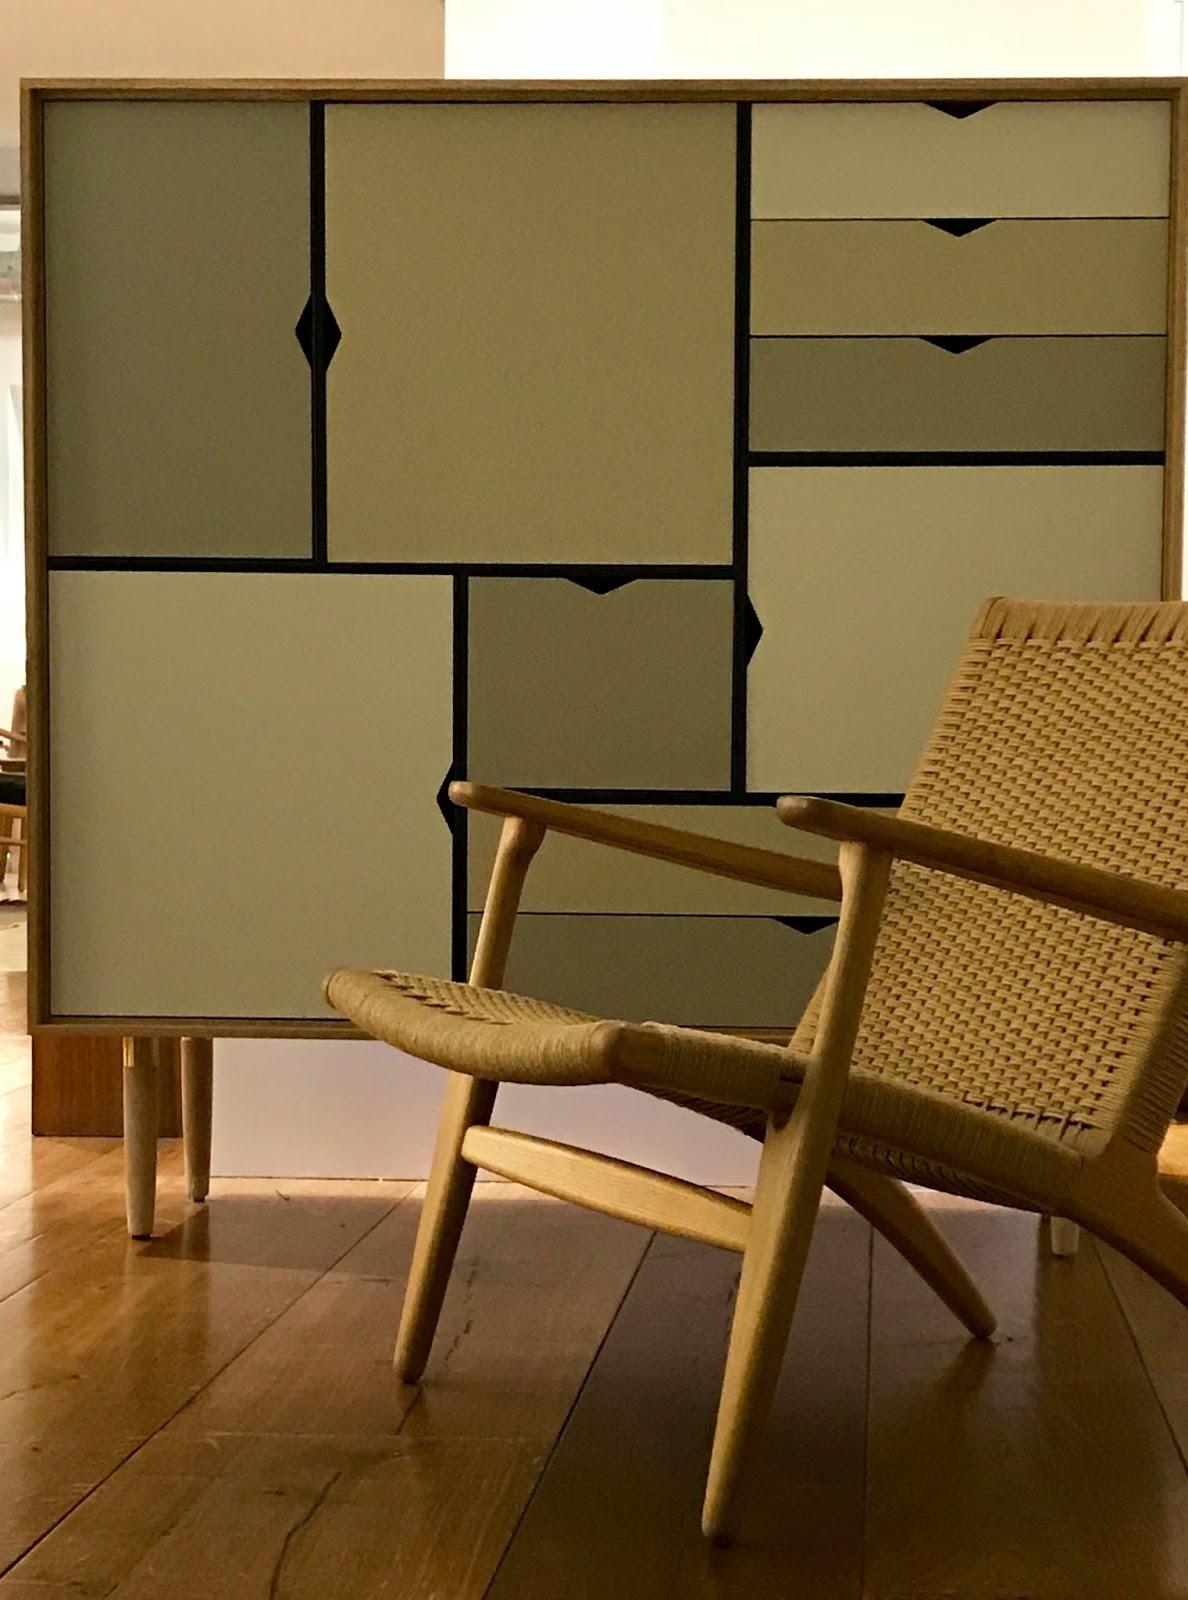 S3 storage unit - Andersen furniture - en Chic & Soul - Distribuidor ...